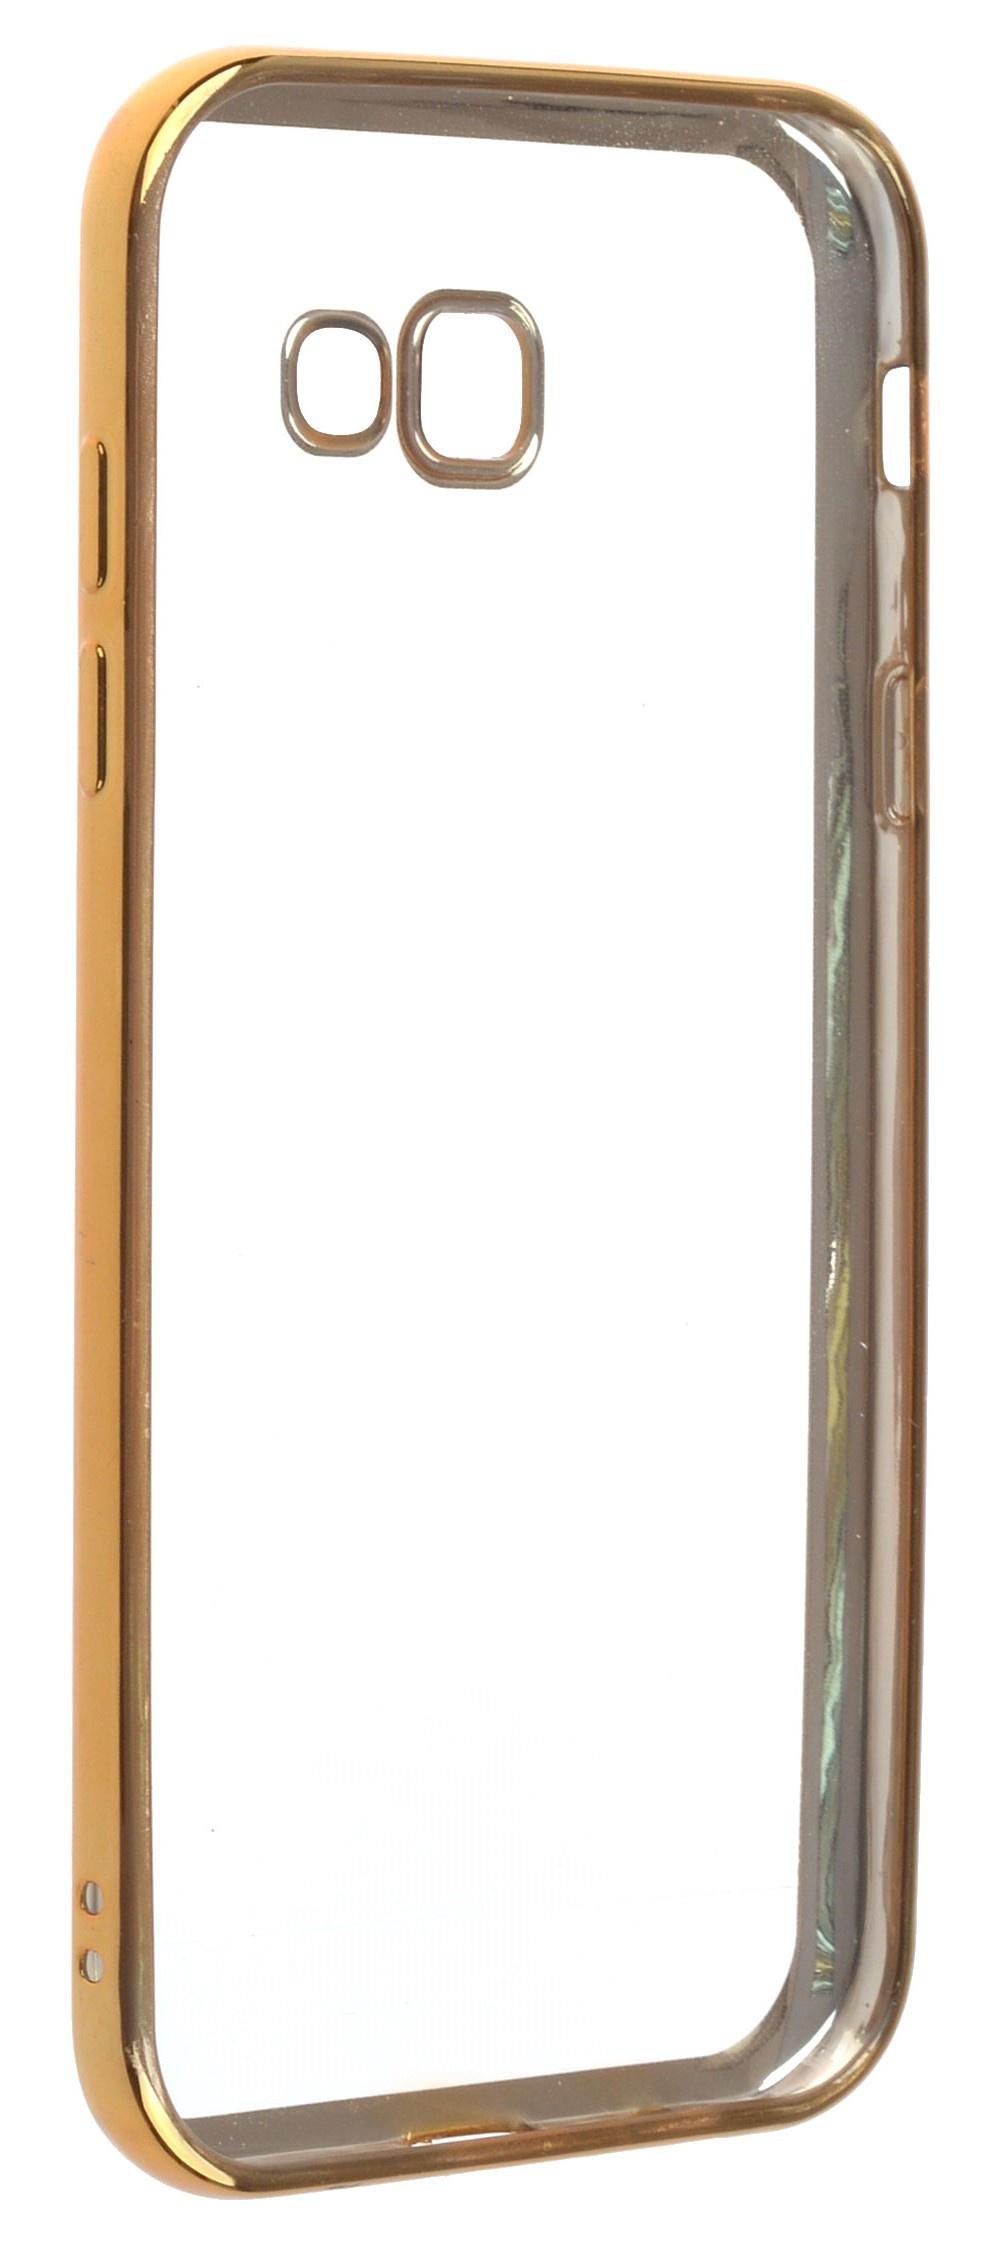 Чехол для сотового телефона skinBOX Silicone chrome border, 4660041408249, золотой аксессуар чехол накладка innovation silicone 0 33mm для apple iphone 5 5s transparent 12001